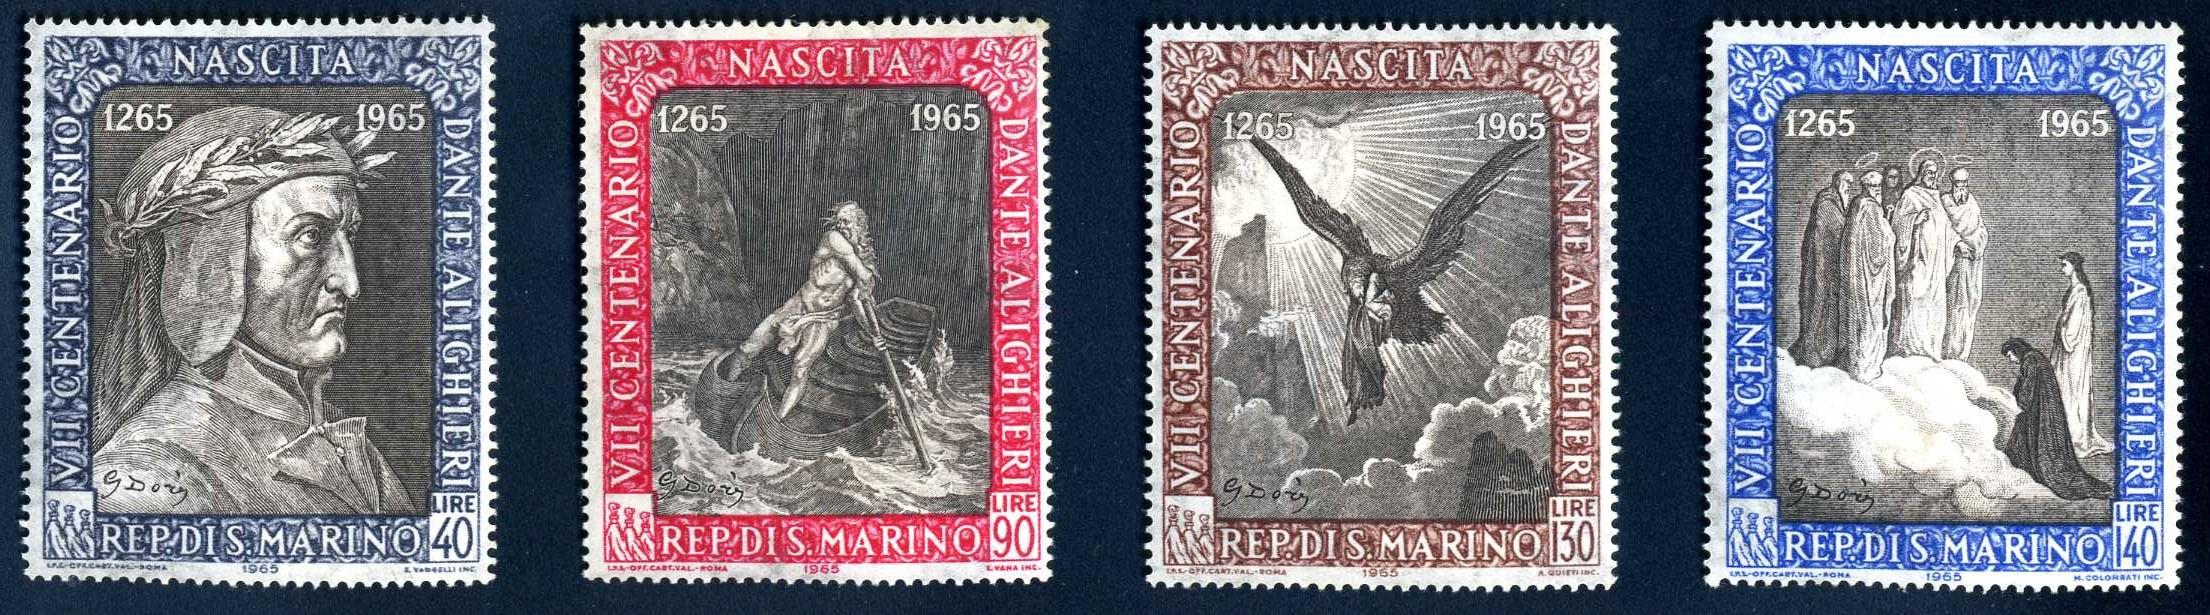 SM 191 1965 Dante Aleghieri.jpg